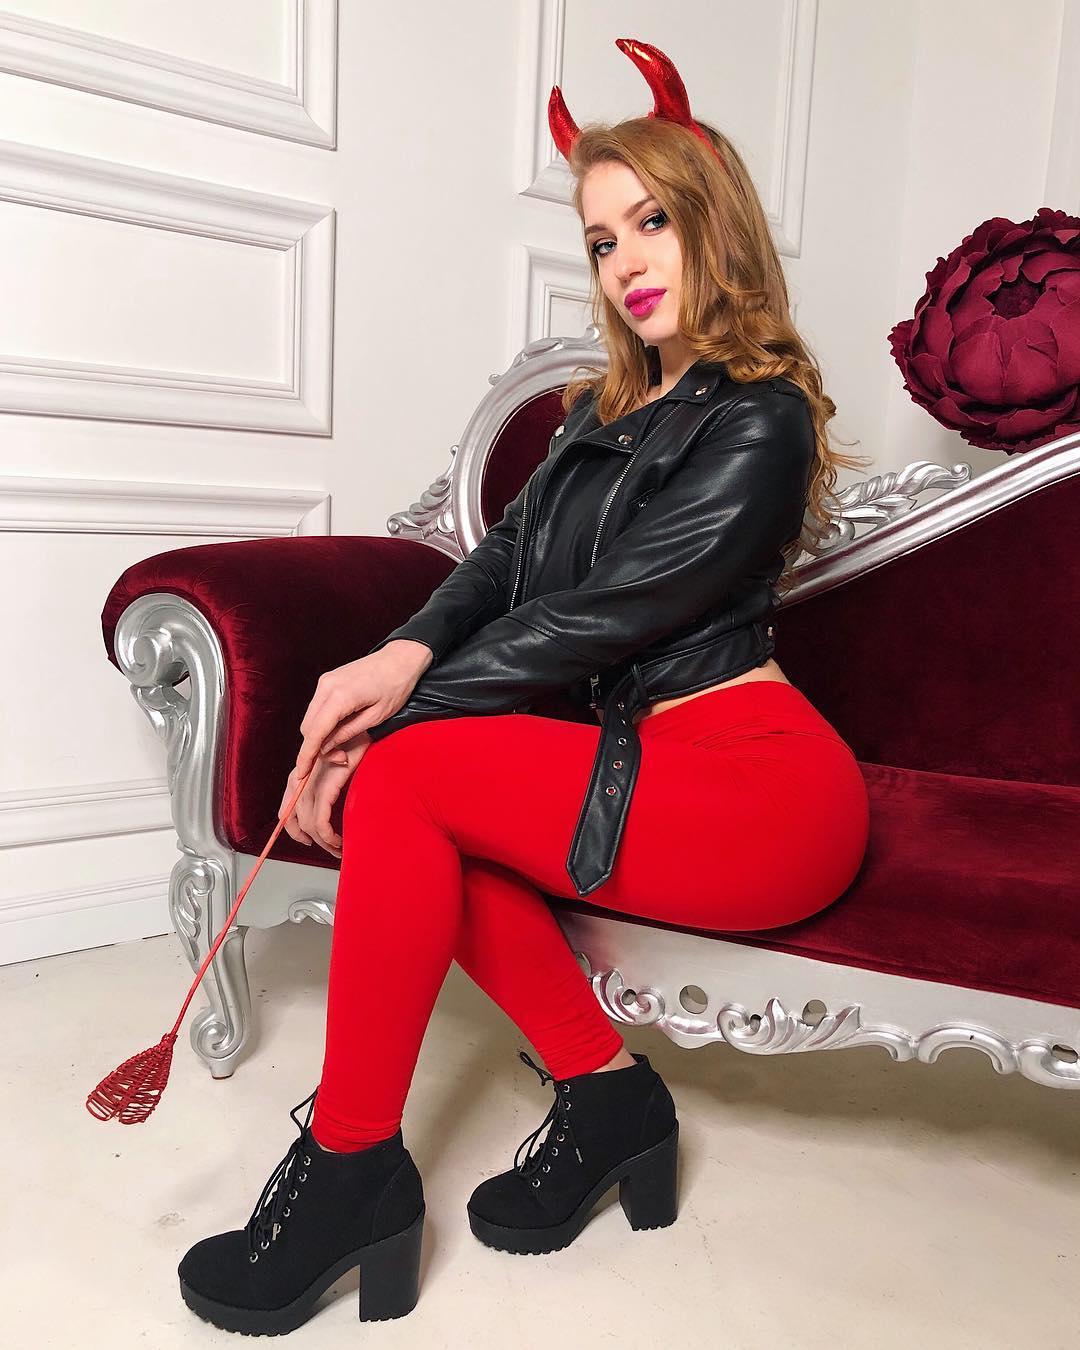 Polina-Dubkova-Wa-a-ers-Insta-Fit-Bio-4